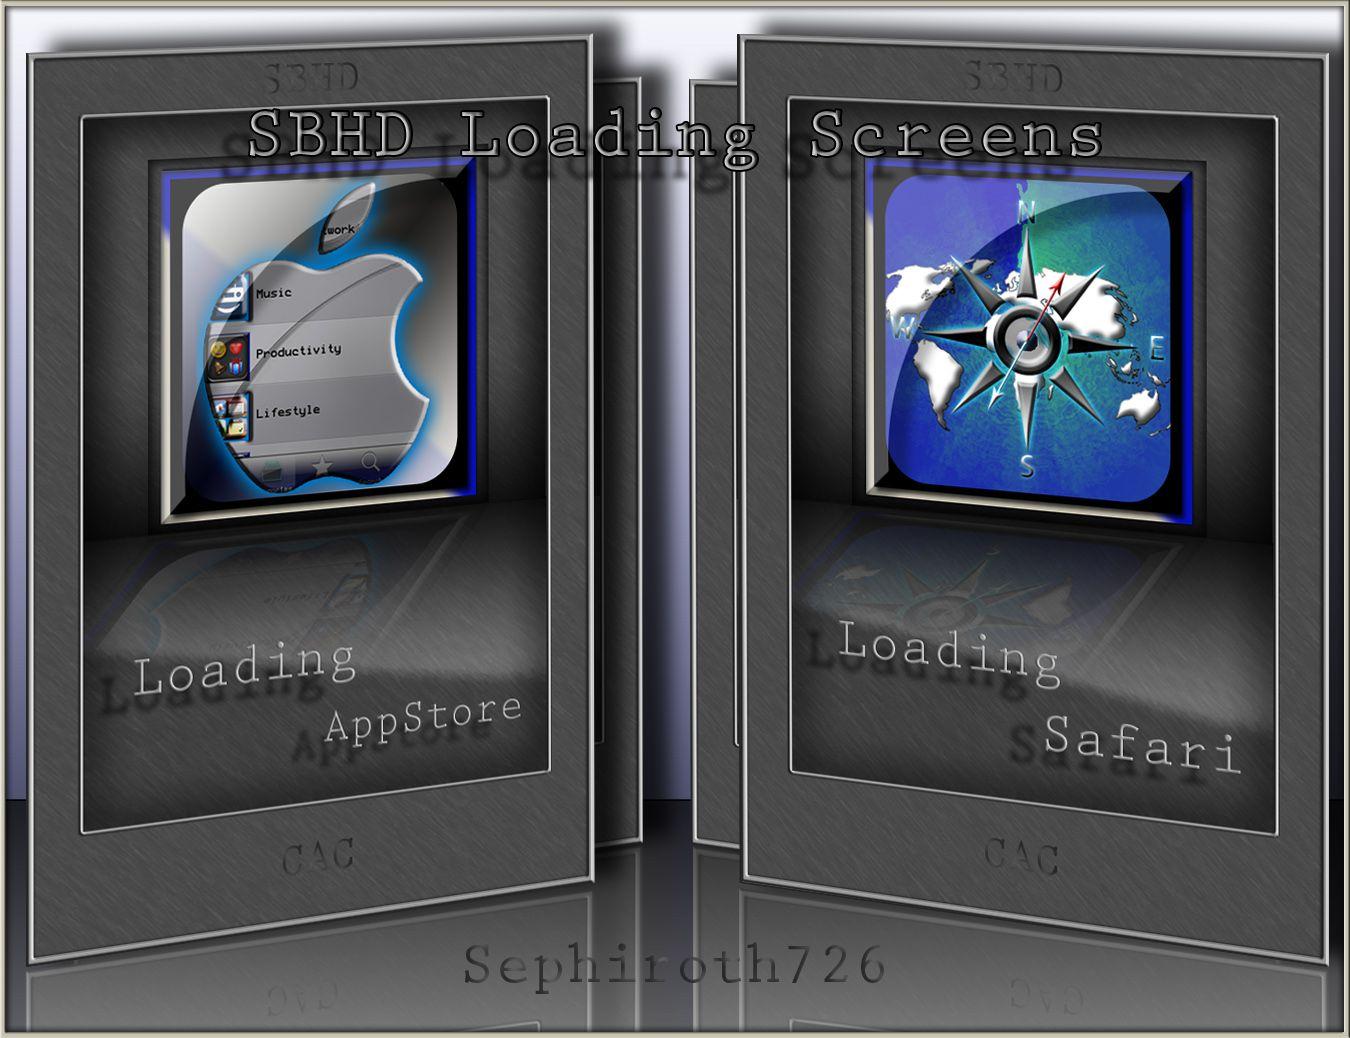 Download SBHD 1.6.5